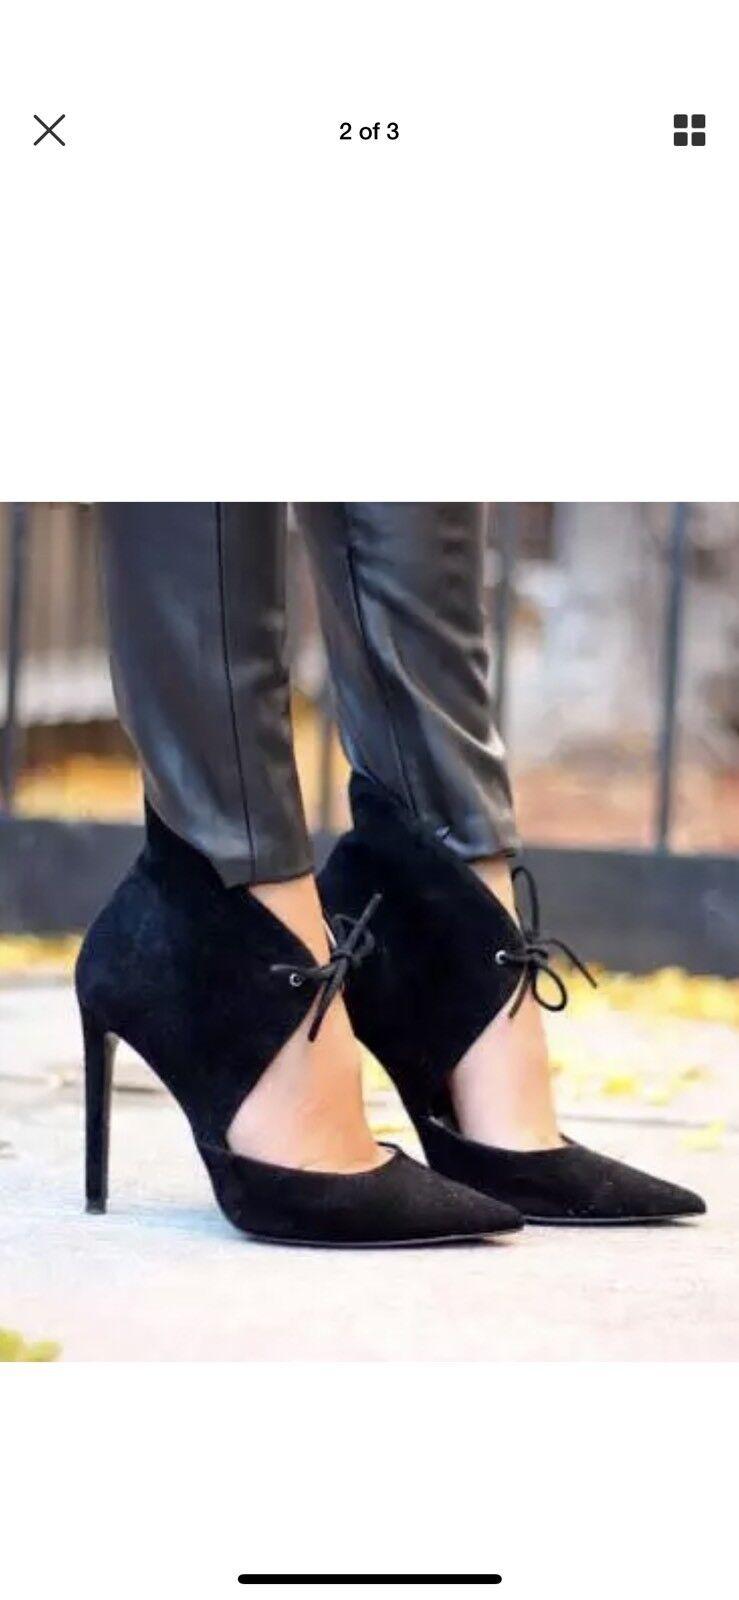 Grandes zapatos con descuento Zara Black Suede Ankle/heel Boot Size 6 RARE